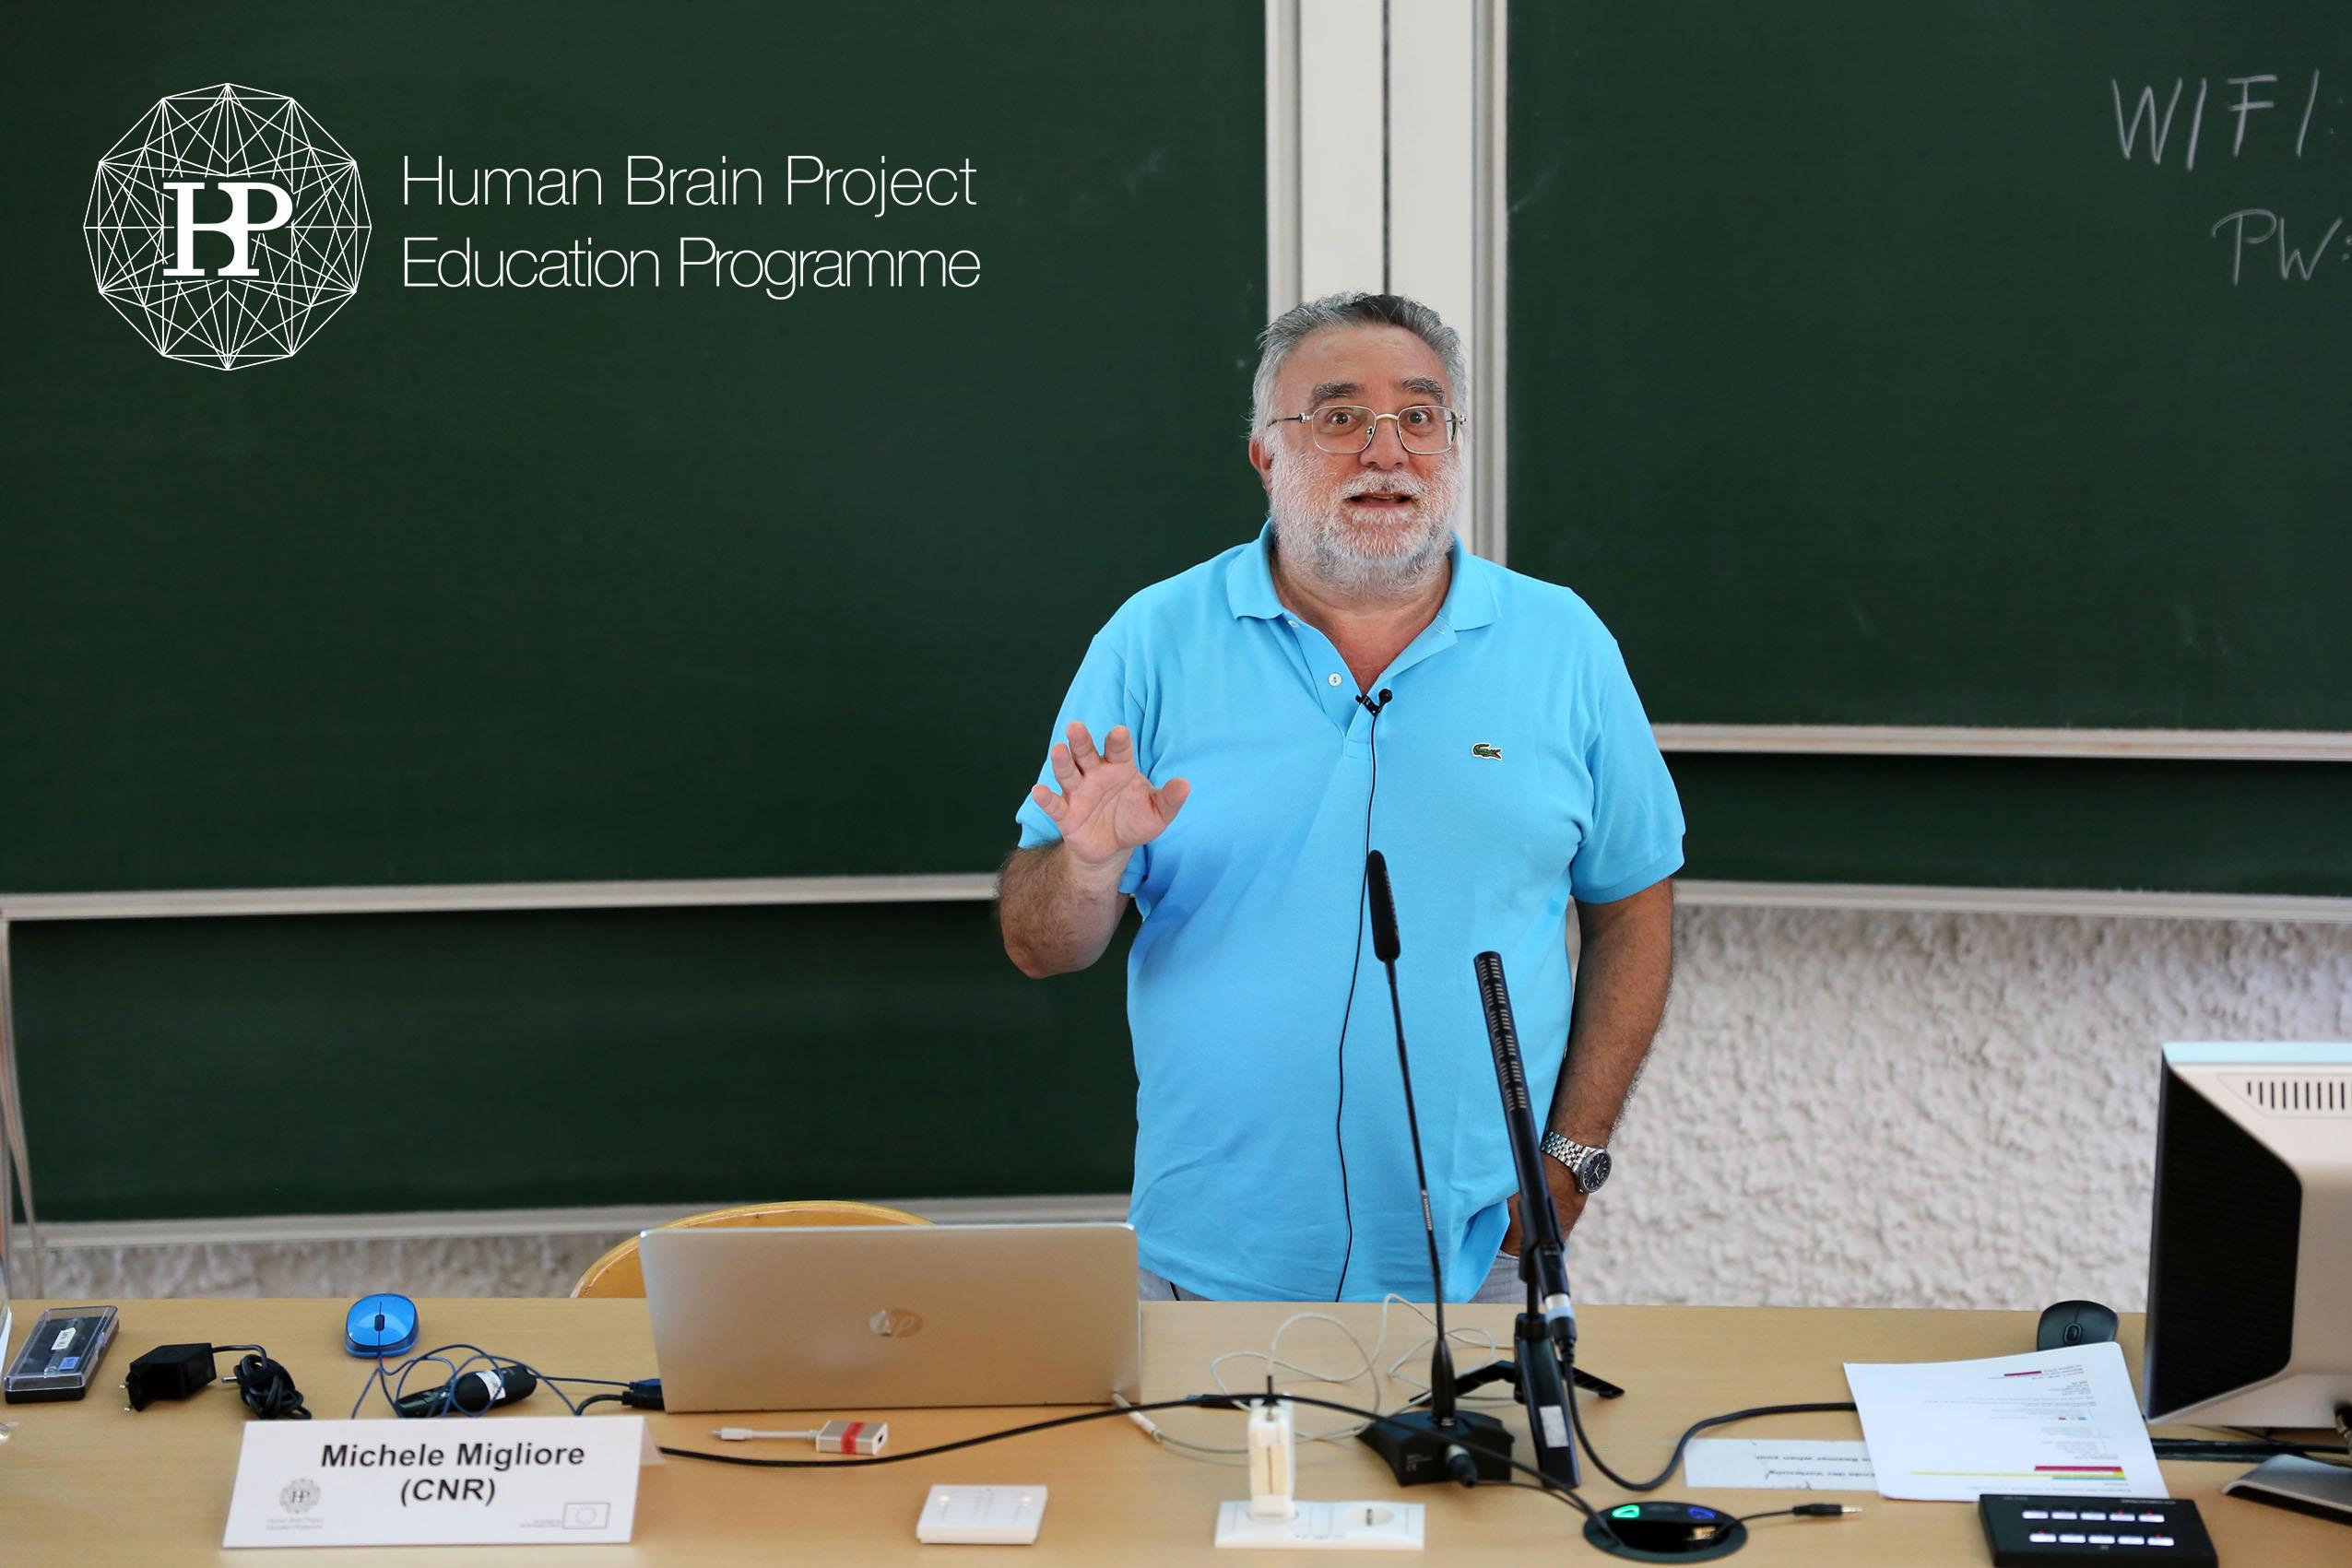 HBP_1st_Neurobiology_workshop_27.jpg -